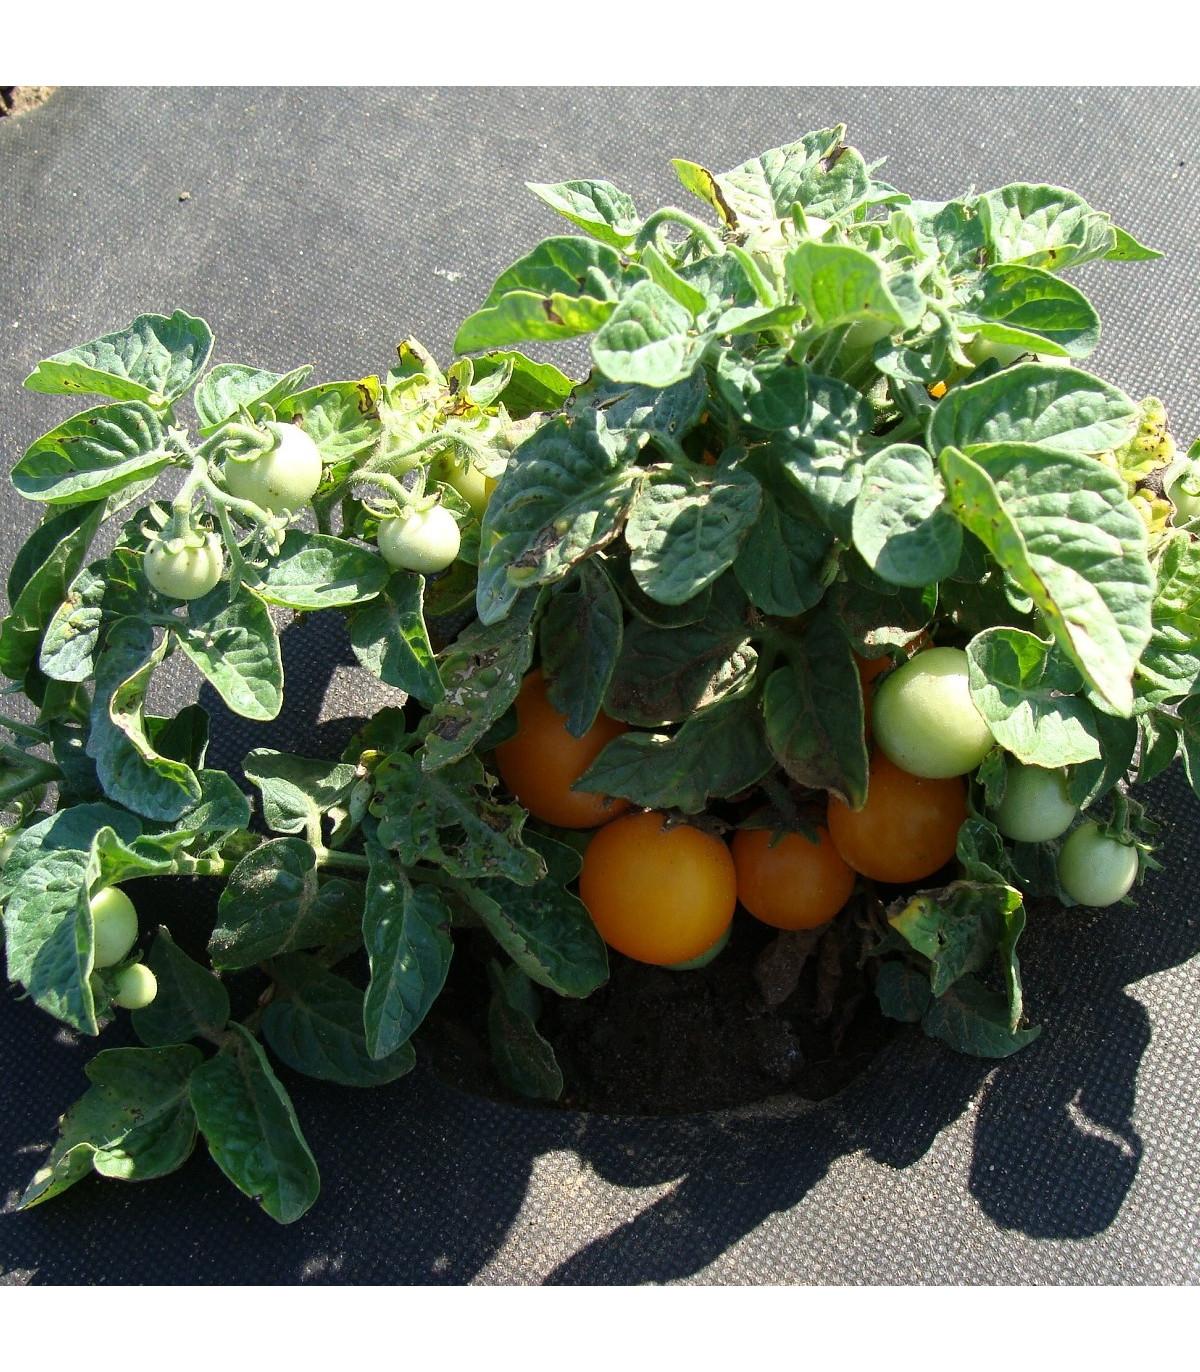 Rajče Venus - Lycopersicon esculentum - osivo rajčat - 10 ks